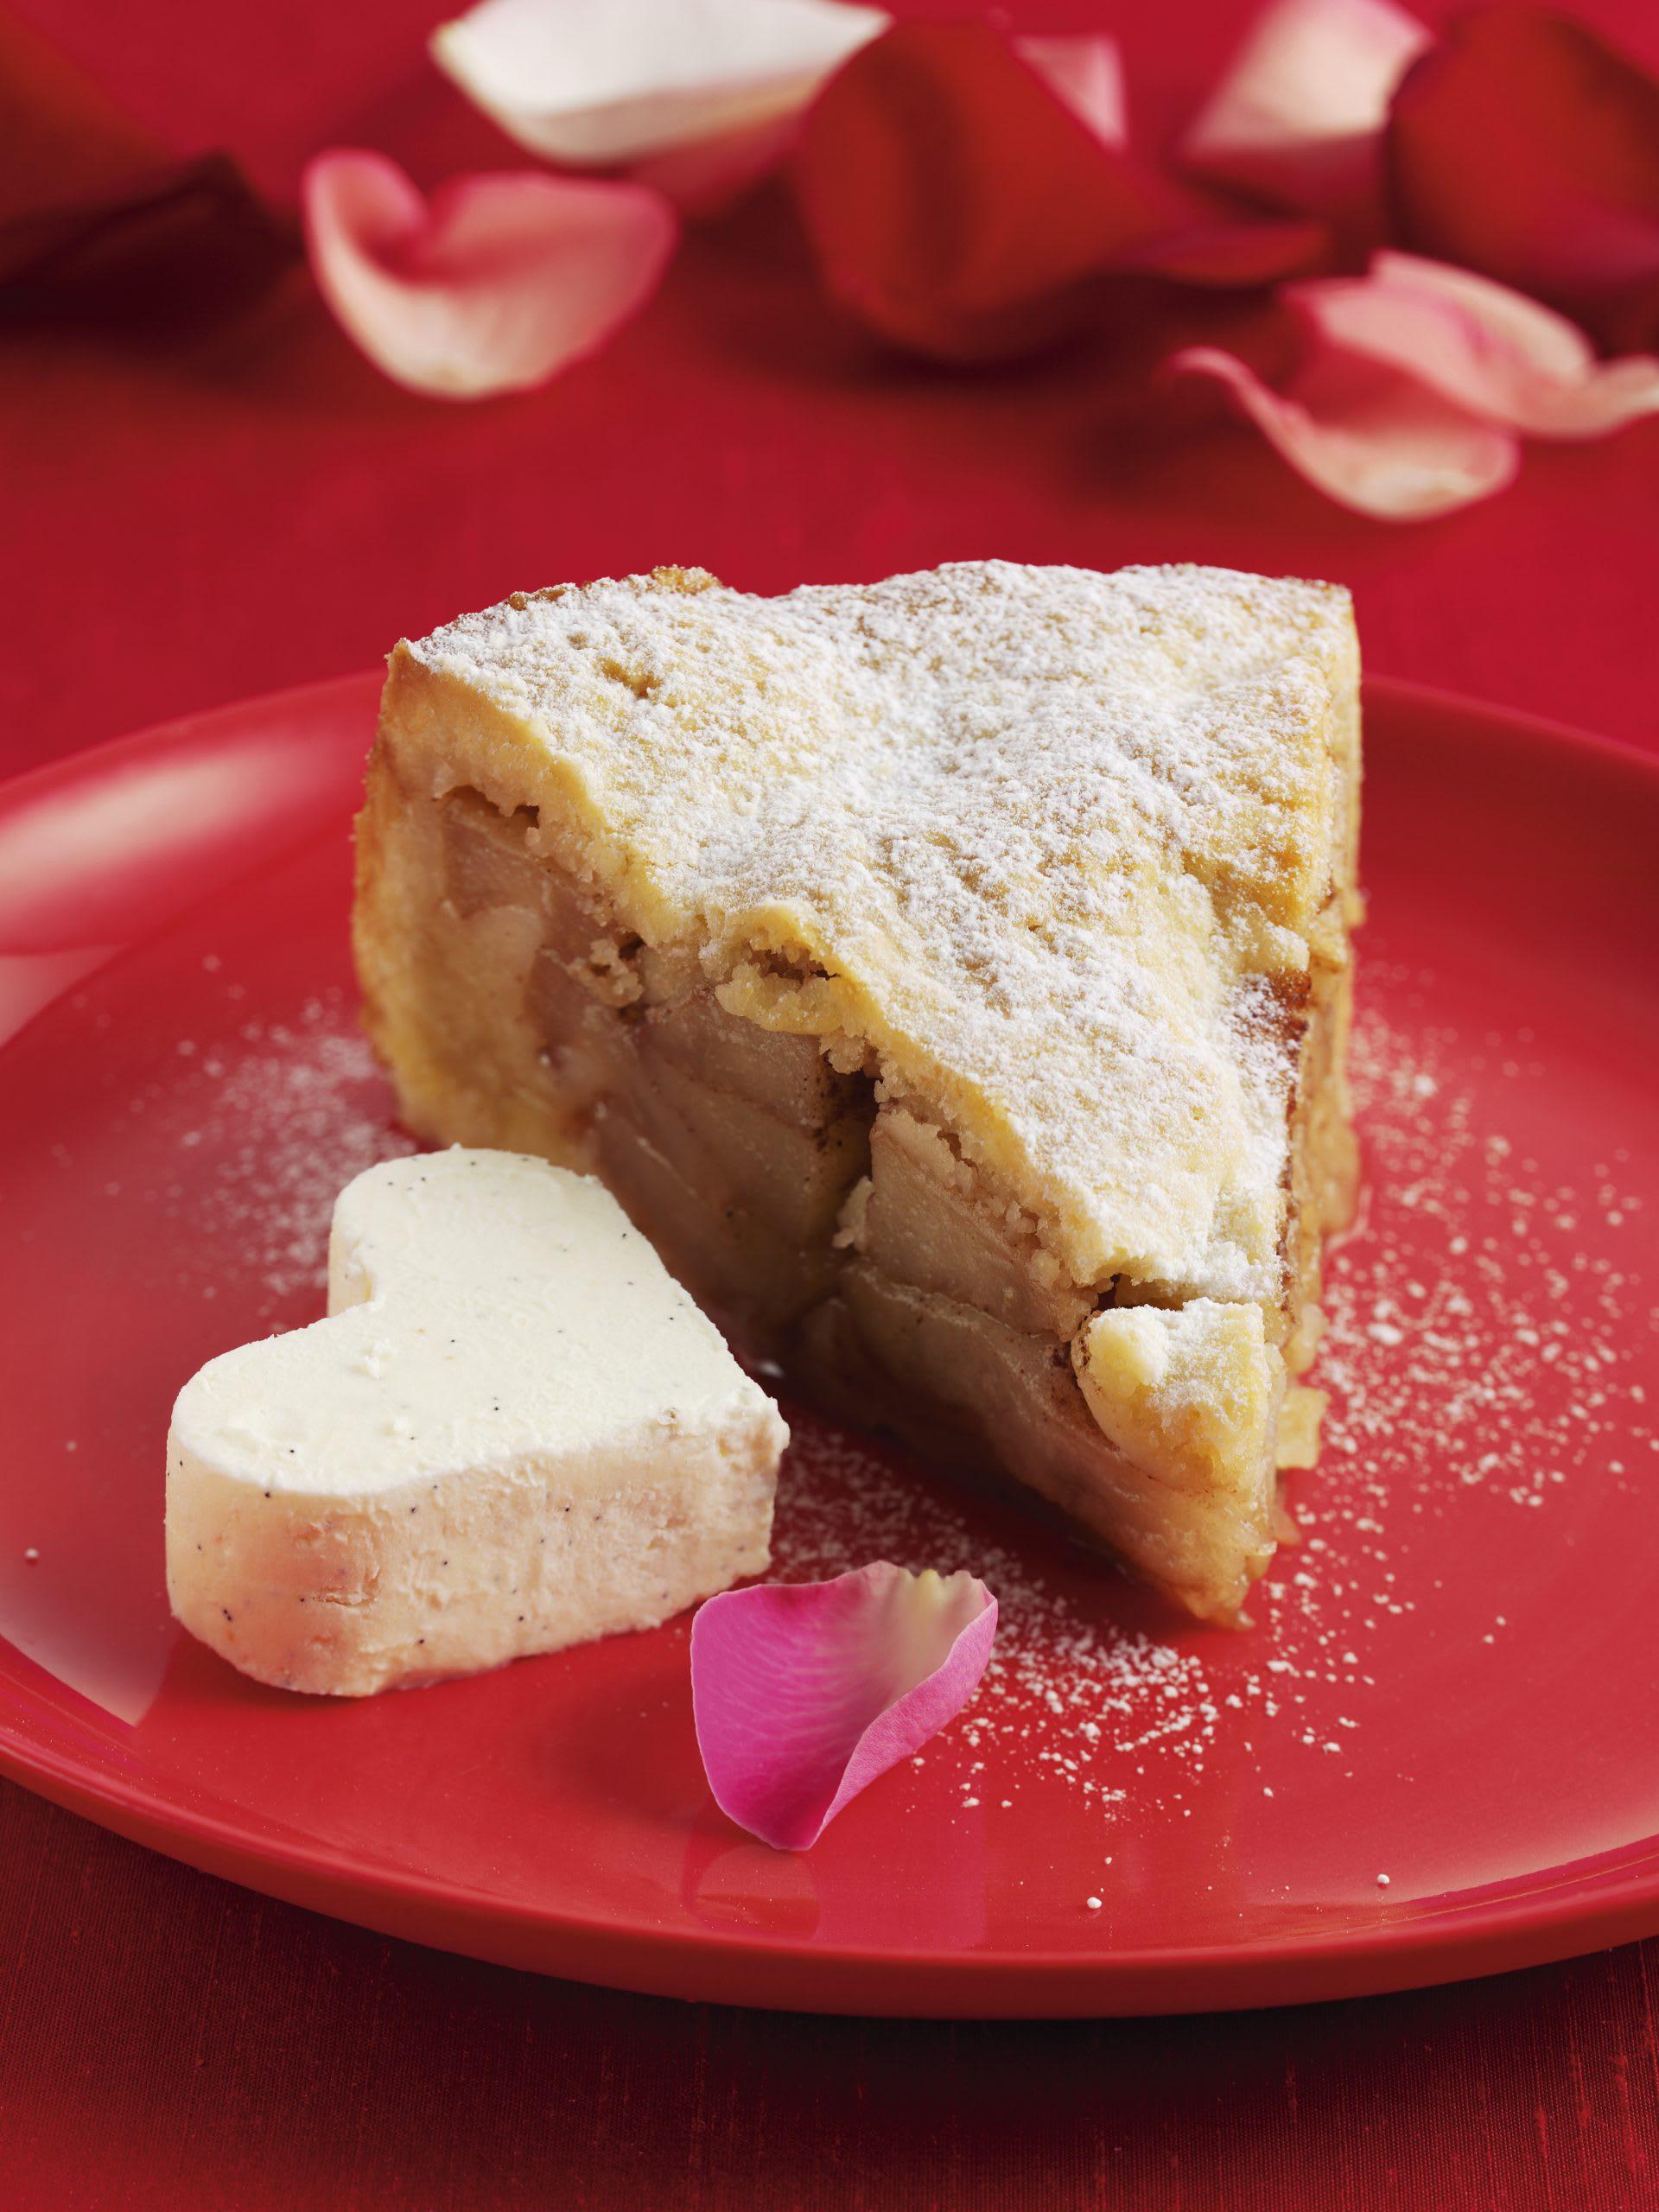 Apple-Pie mit geeisten Vanilleherzen